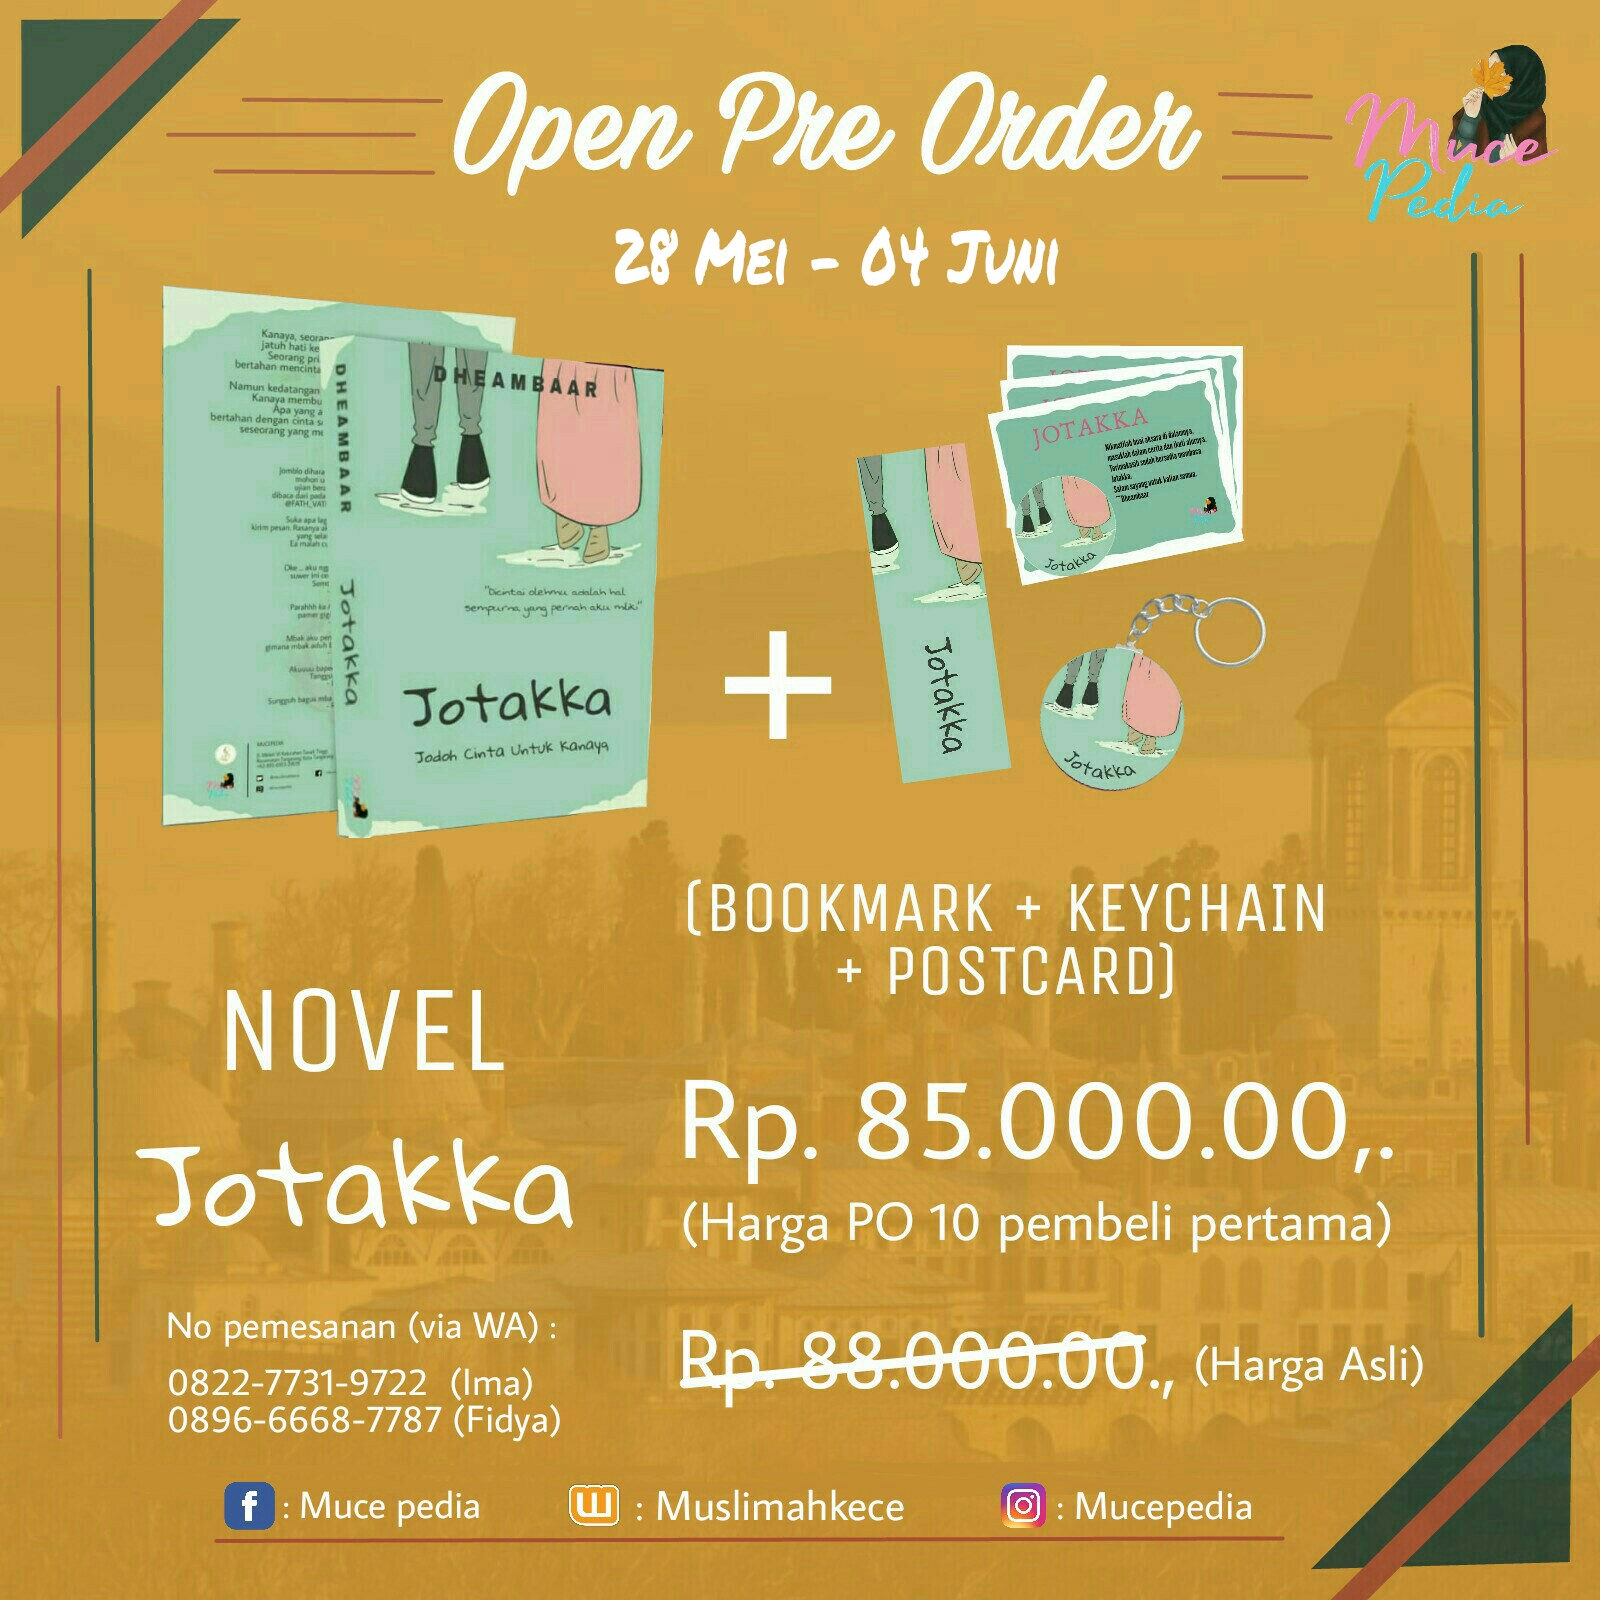 Khodijah Seff Cv Salam Solutions Promosi Novel Jotakka Karya Dheambaar